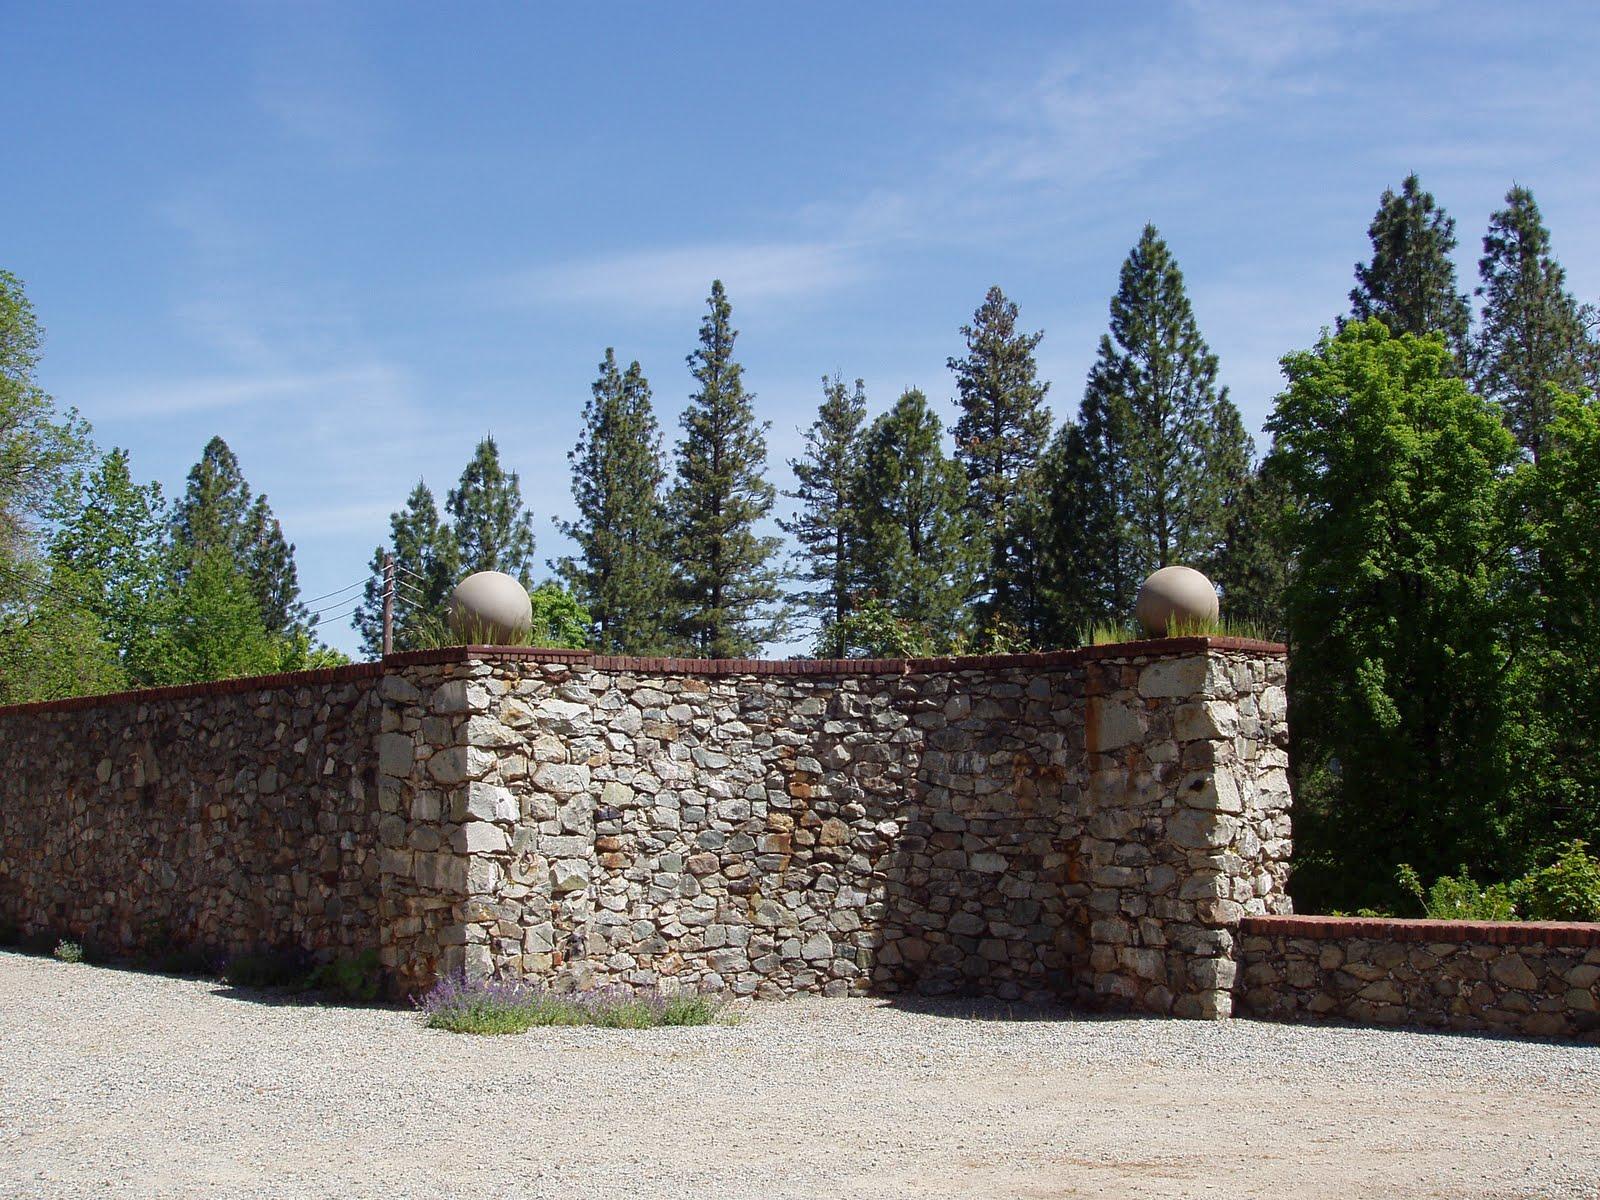 Historic American Landscapes Survey: Bourn Cottage & Garden